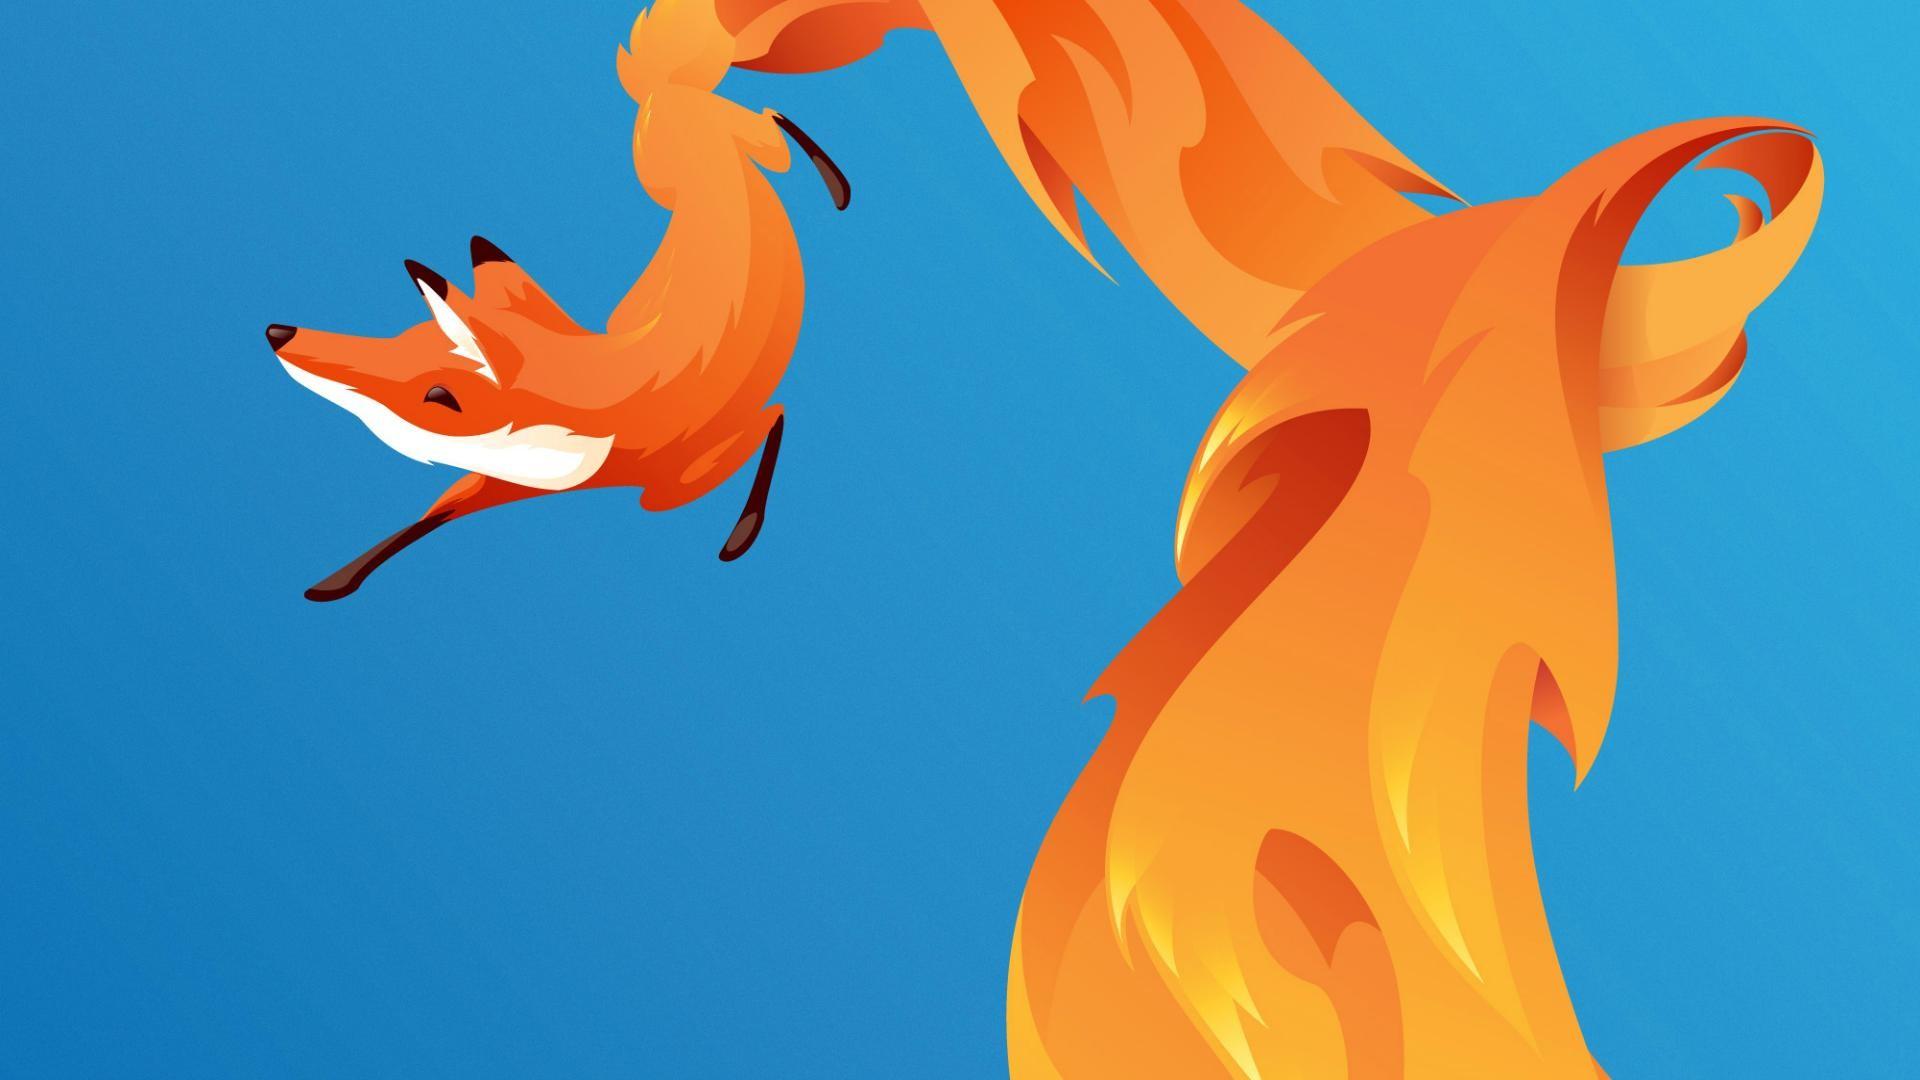 Mozilla Firefox 1920x1080 Px